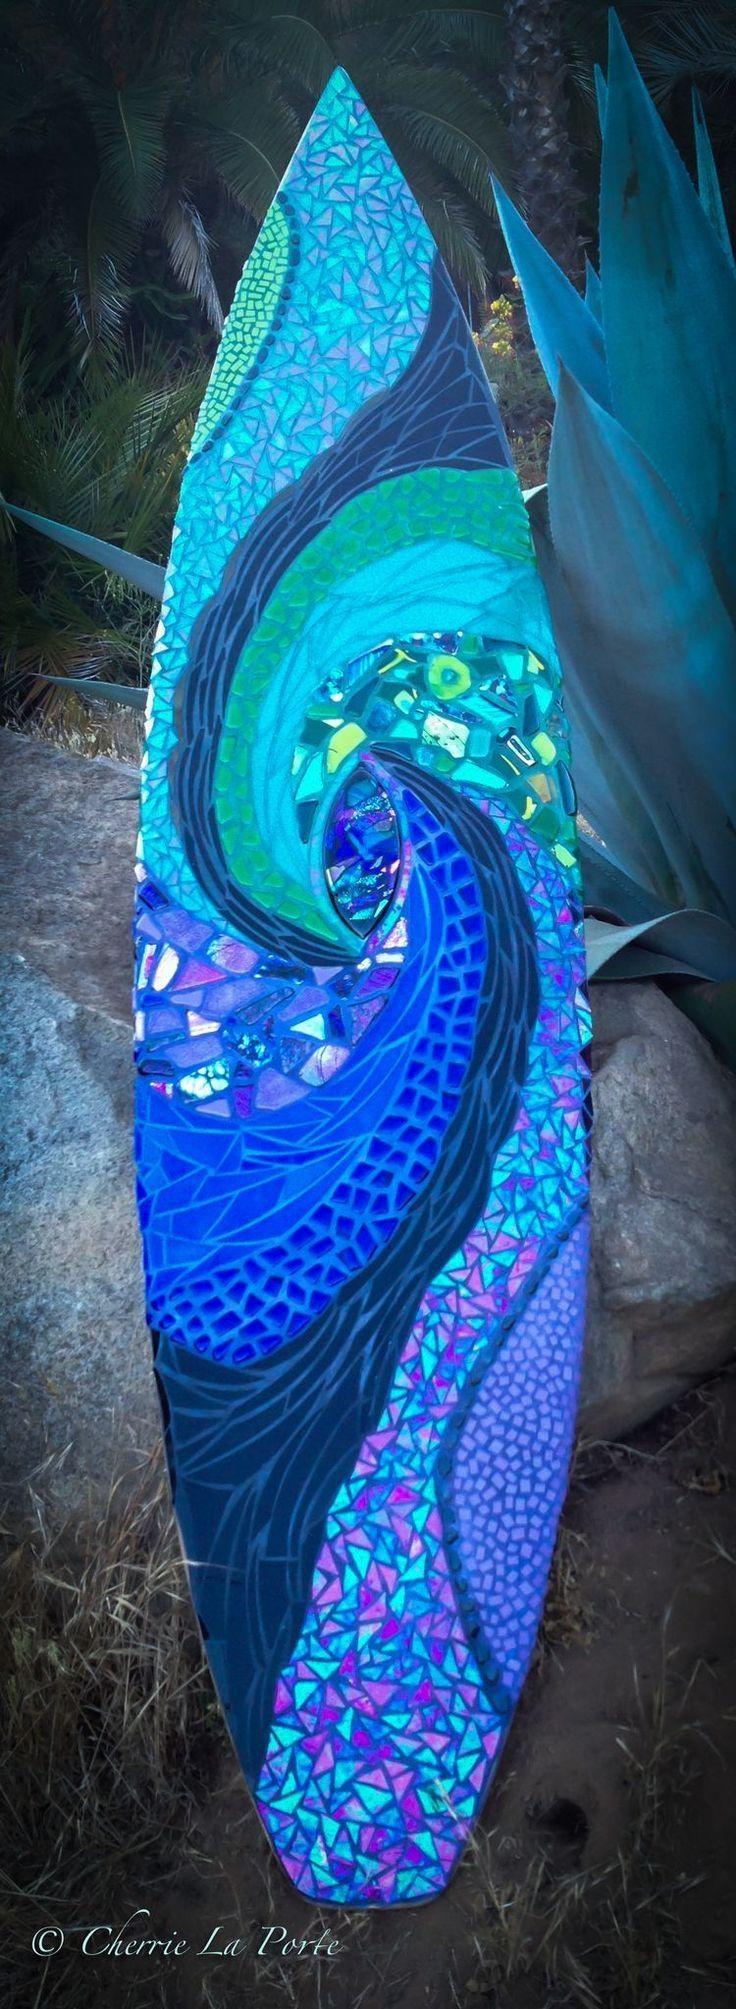 Best 25+ Surfboard Decor Ideas On Pinterest | Surfboard Art With Decorative Surfboard Wall Art (Image 5 of 20)